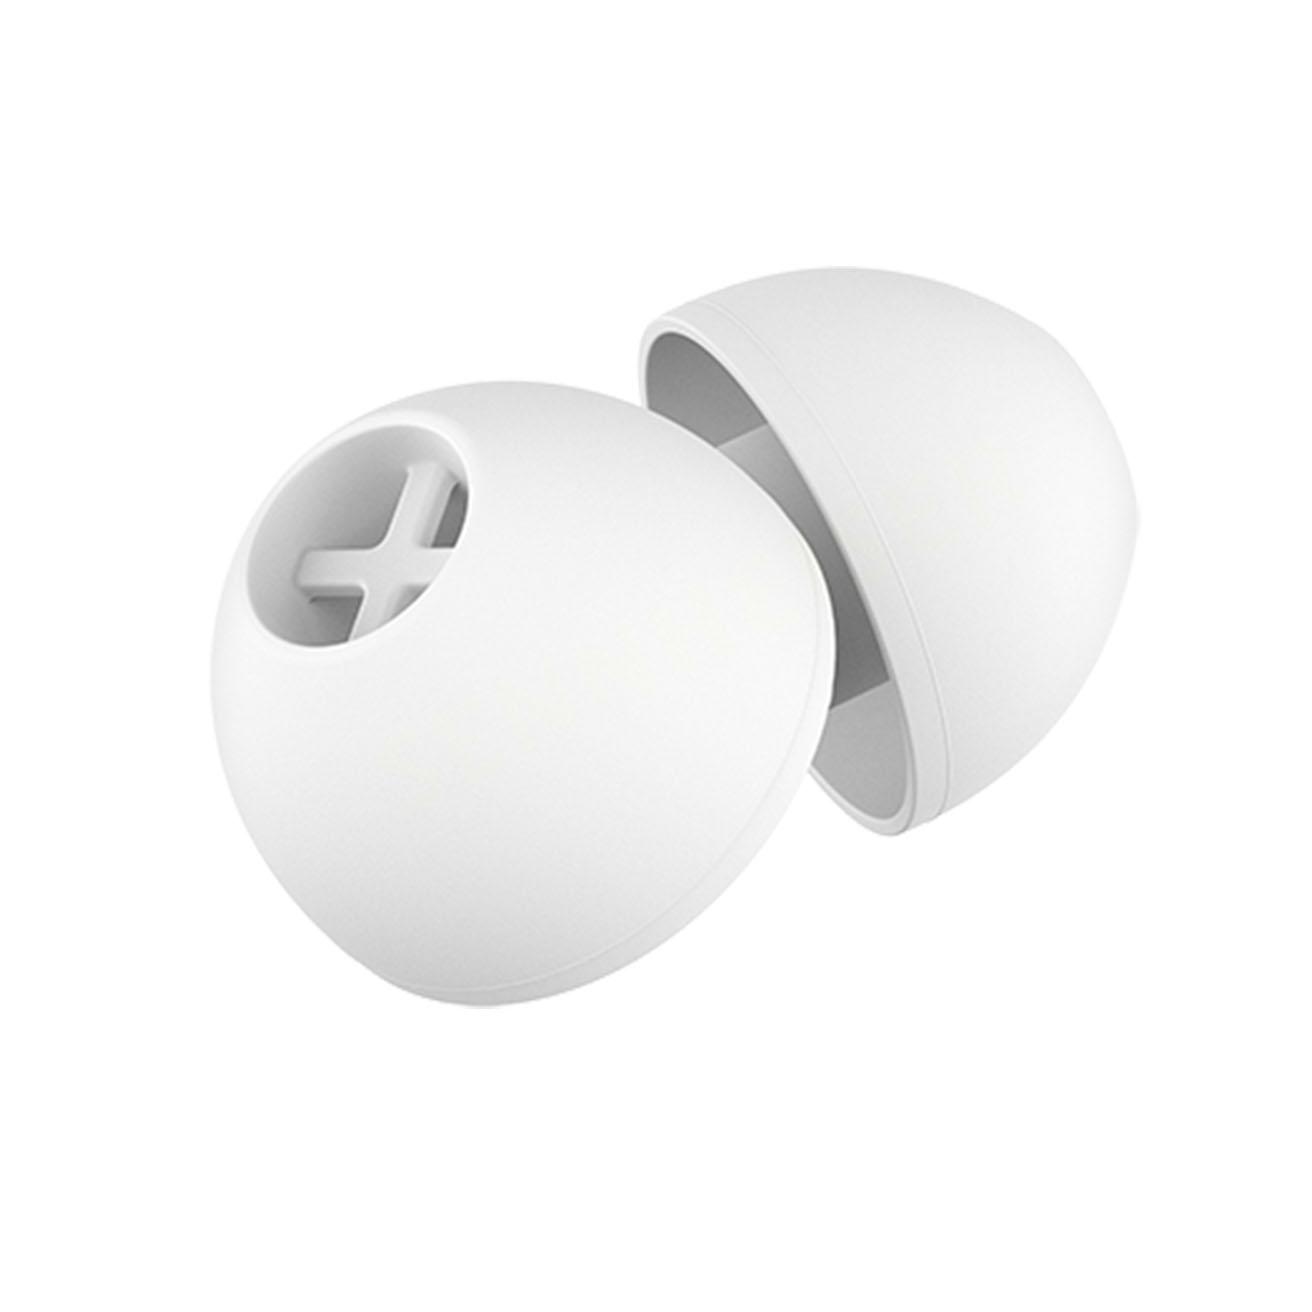 EAR ADAPTER WHITE M, 5PAIR